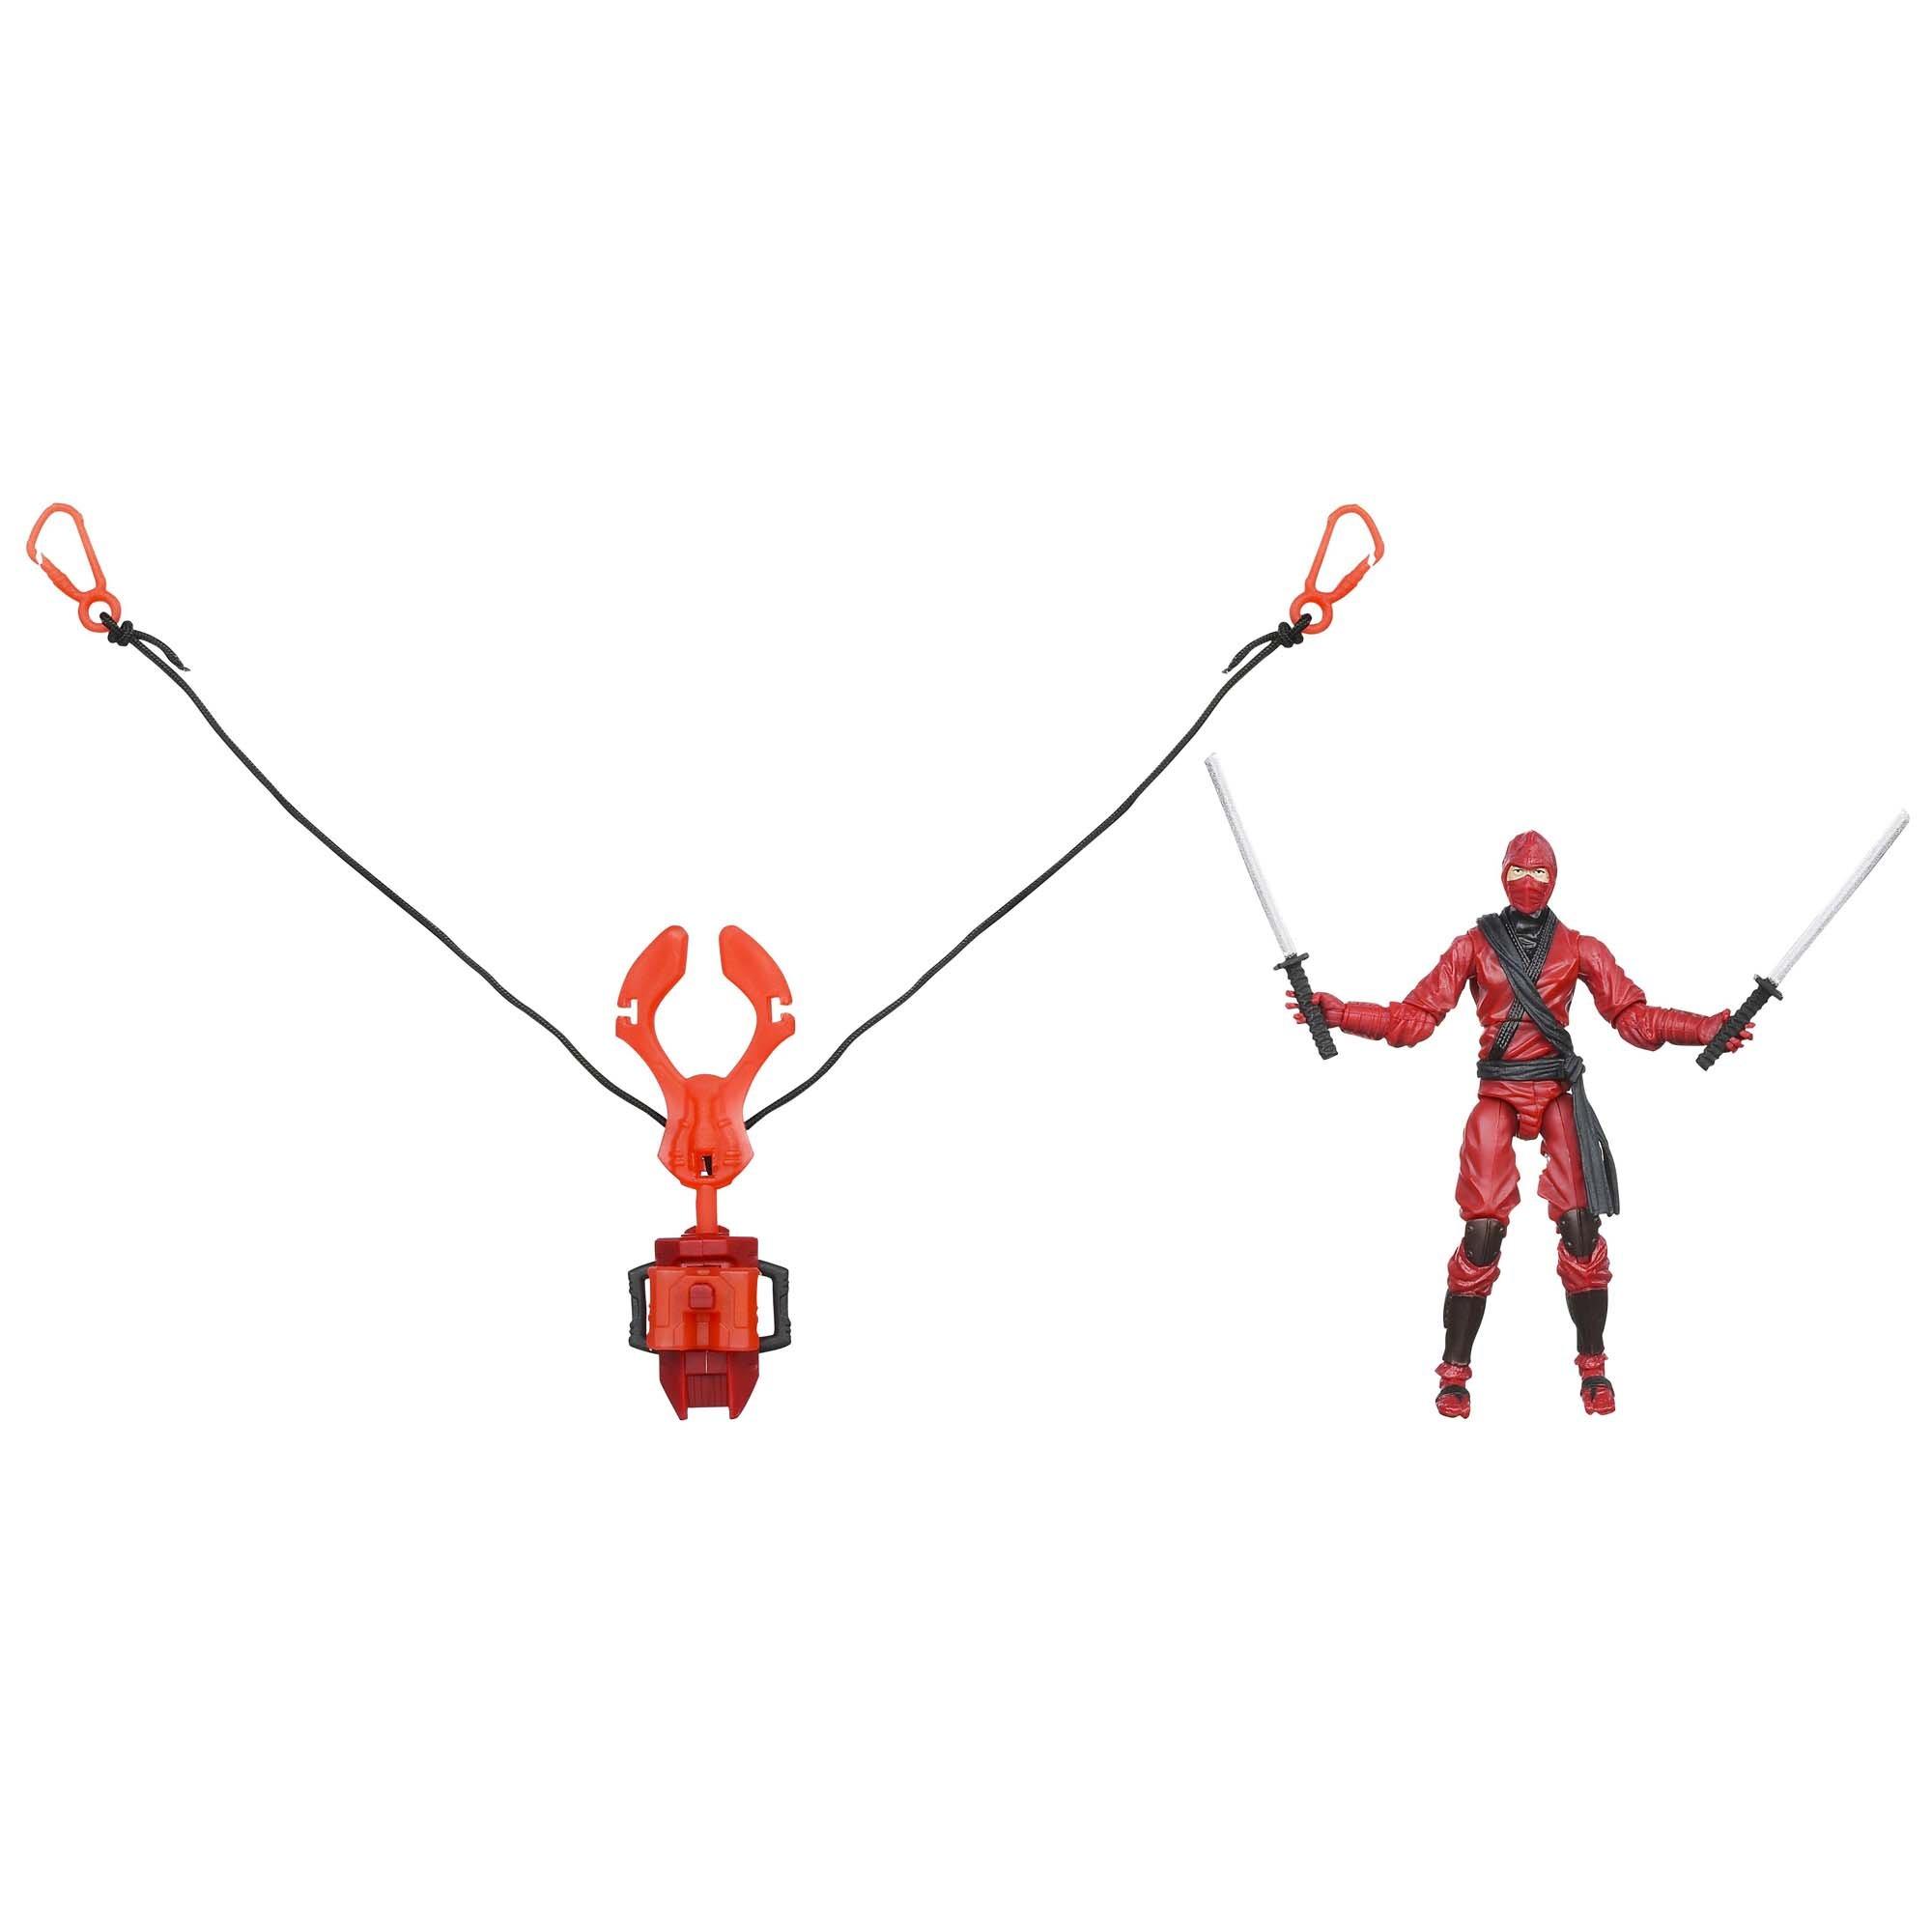 G.I. Joe Retaliation - Red Ninja Figure